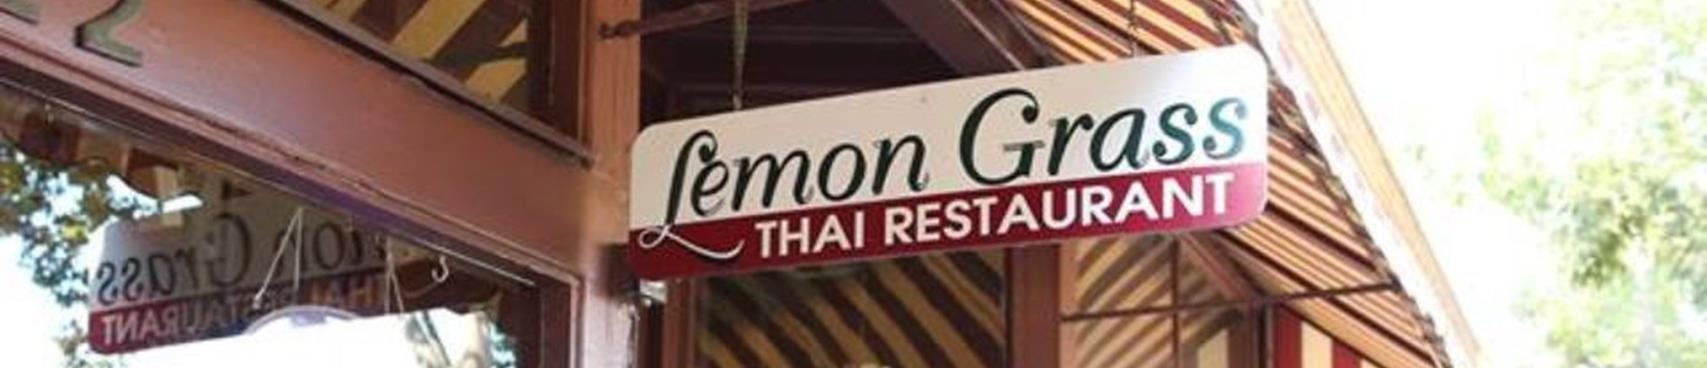 Lemongrass Thai Restaurant - Livermore